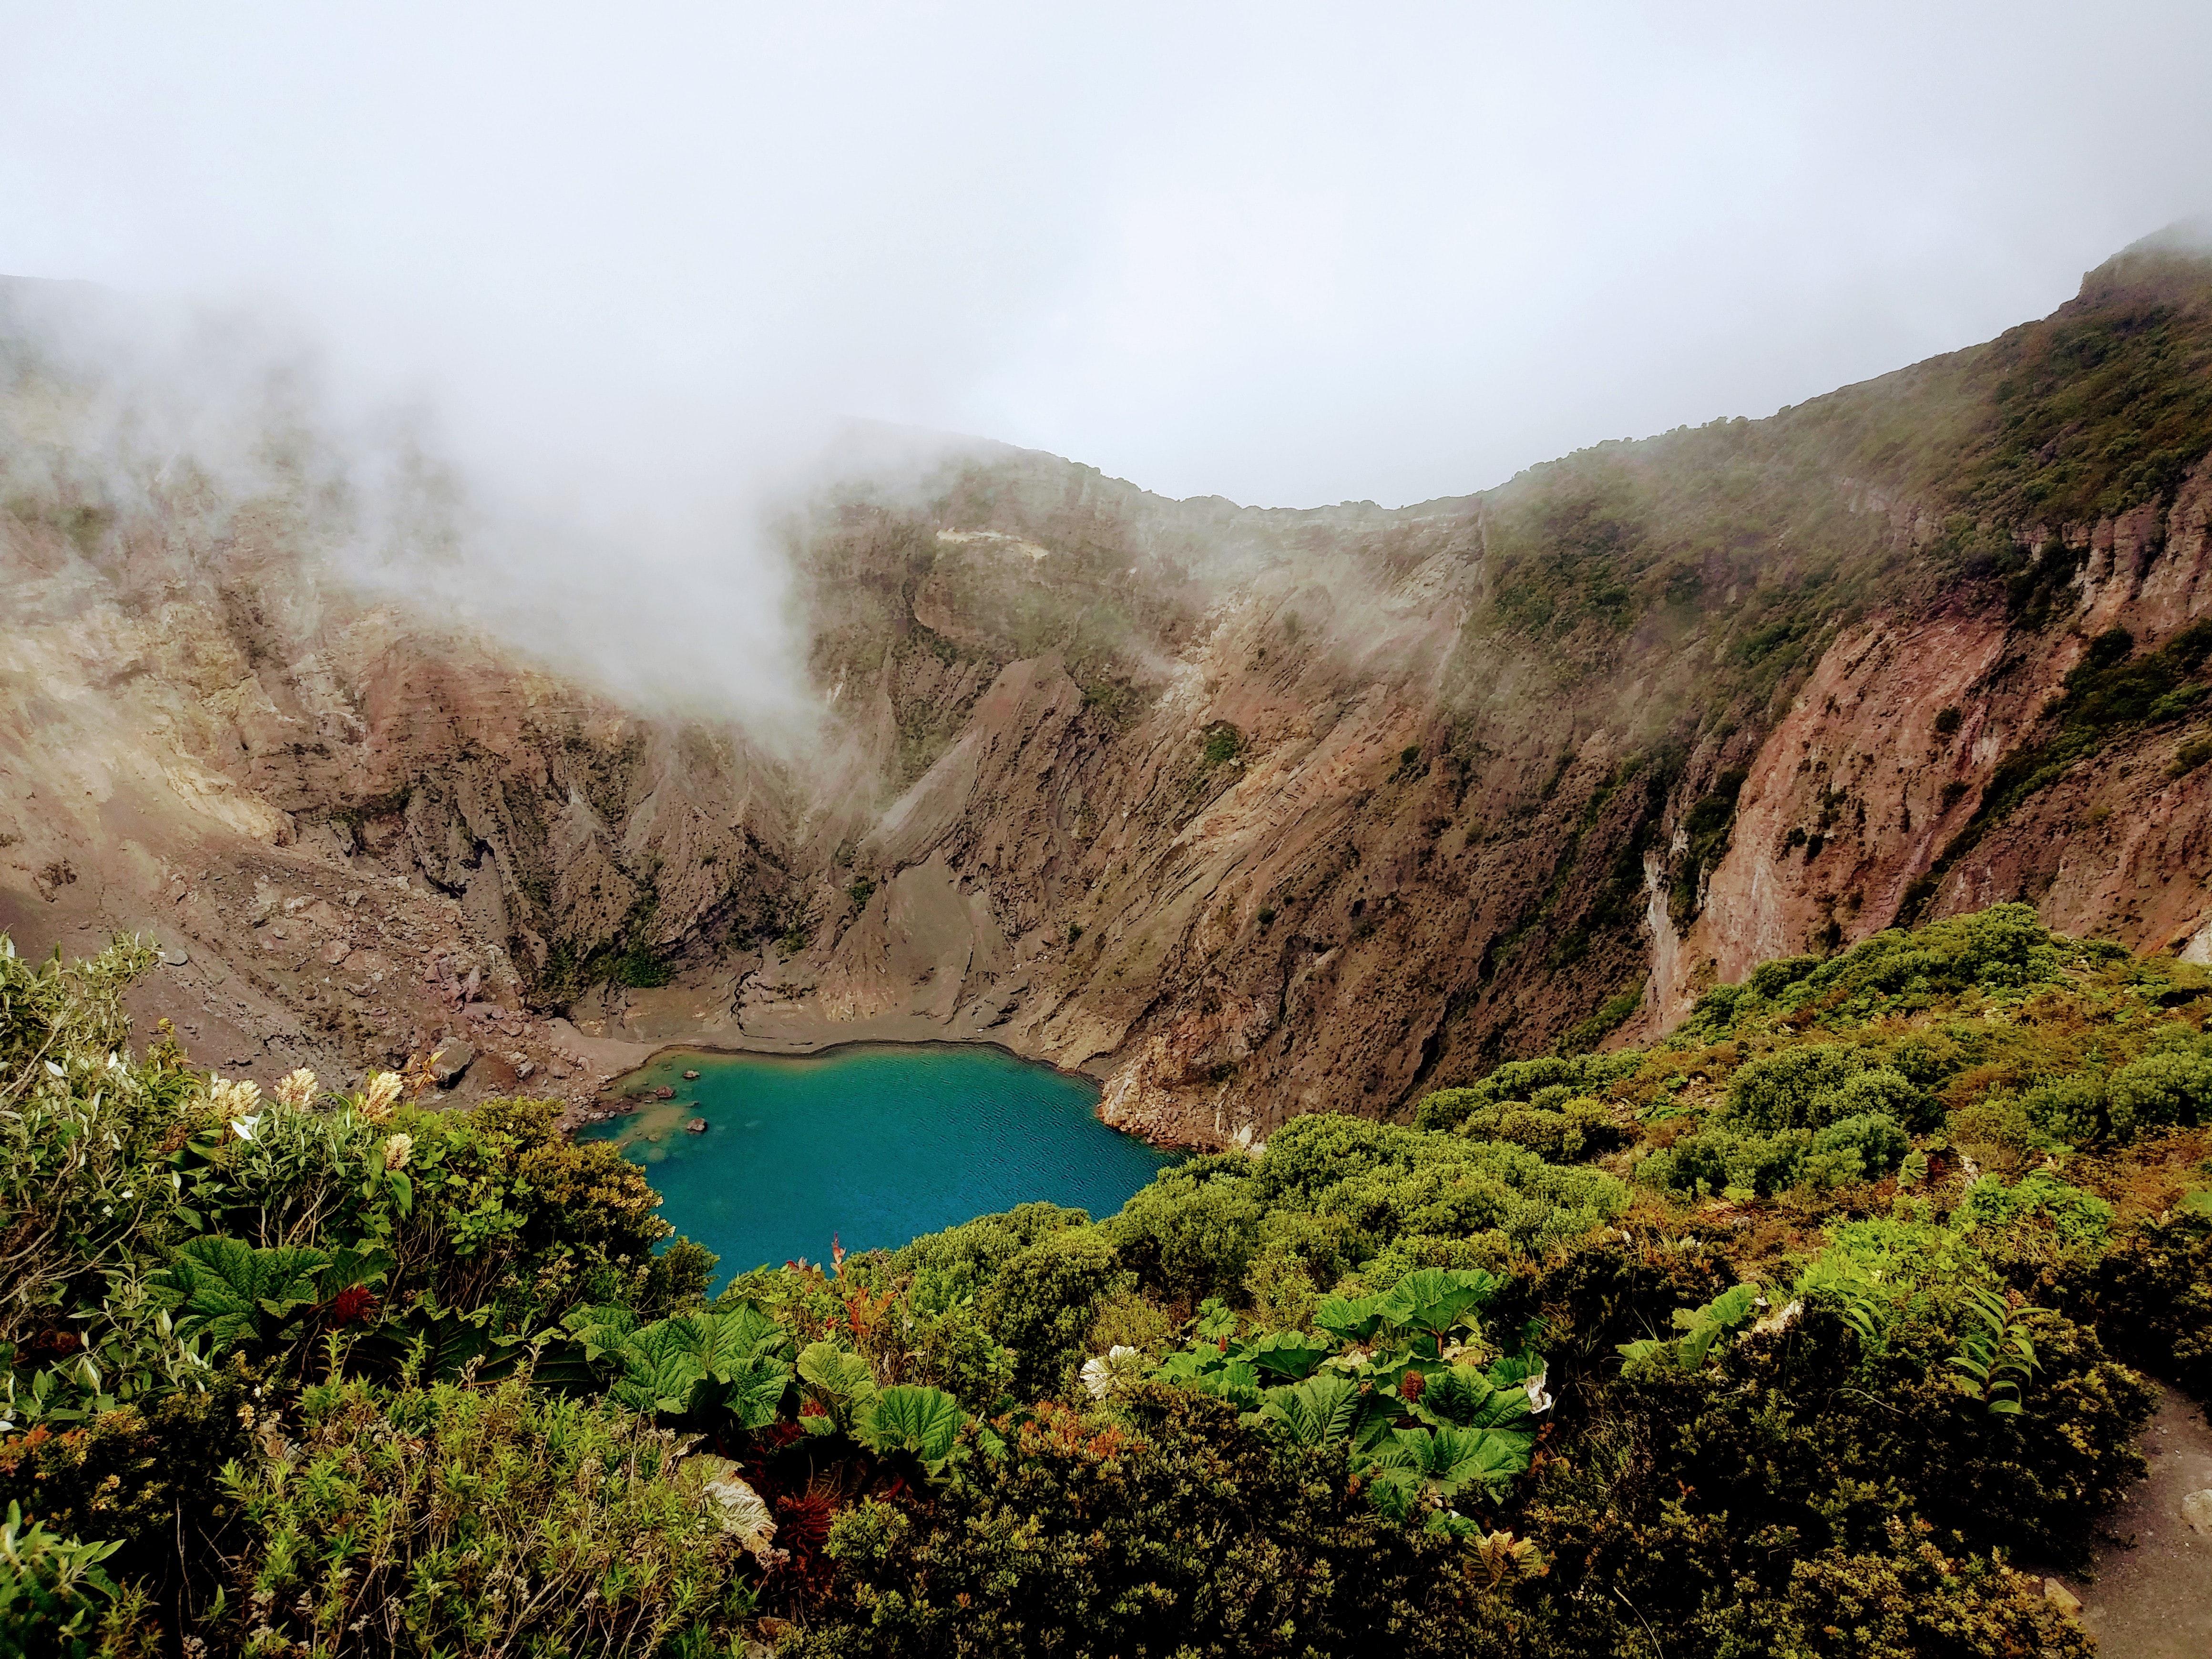 Summer Program - Environmental Conservation | Costa Rica High School Summer Program | Pacific Discovery